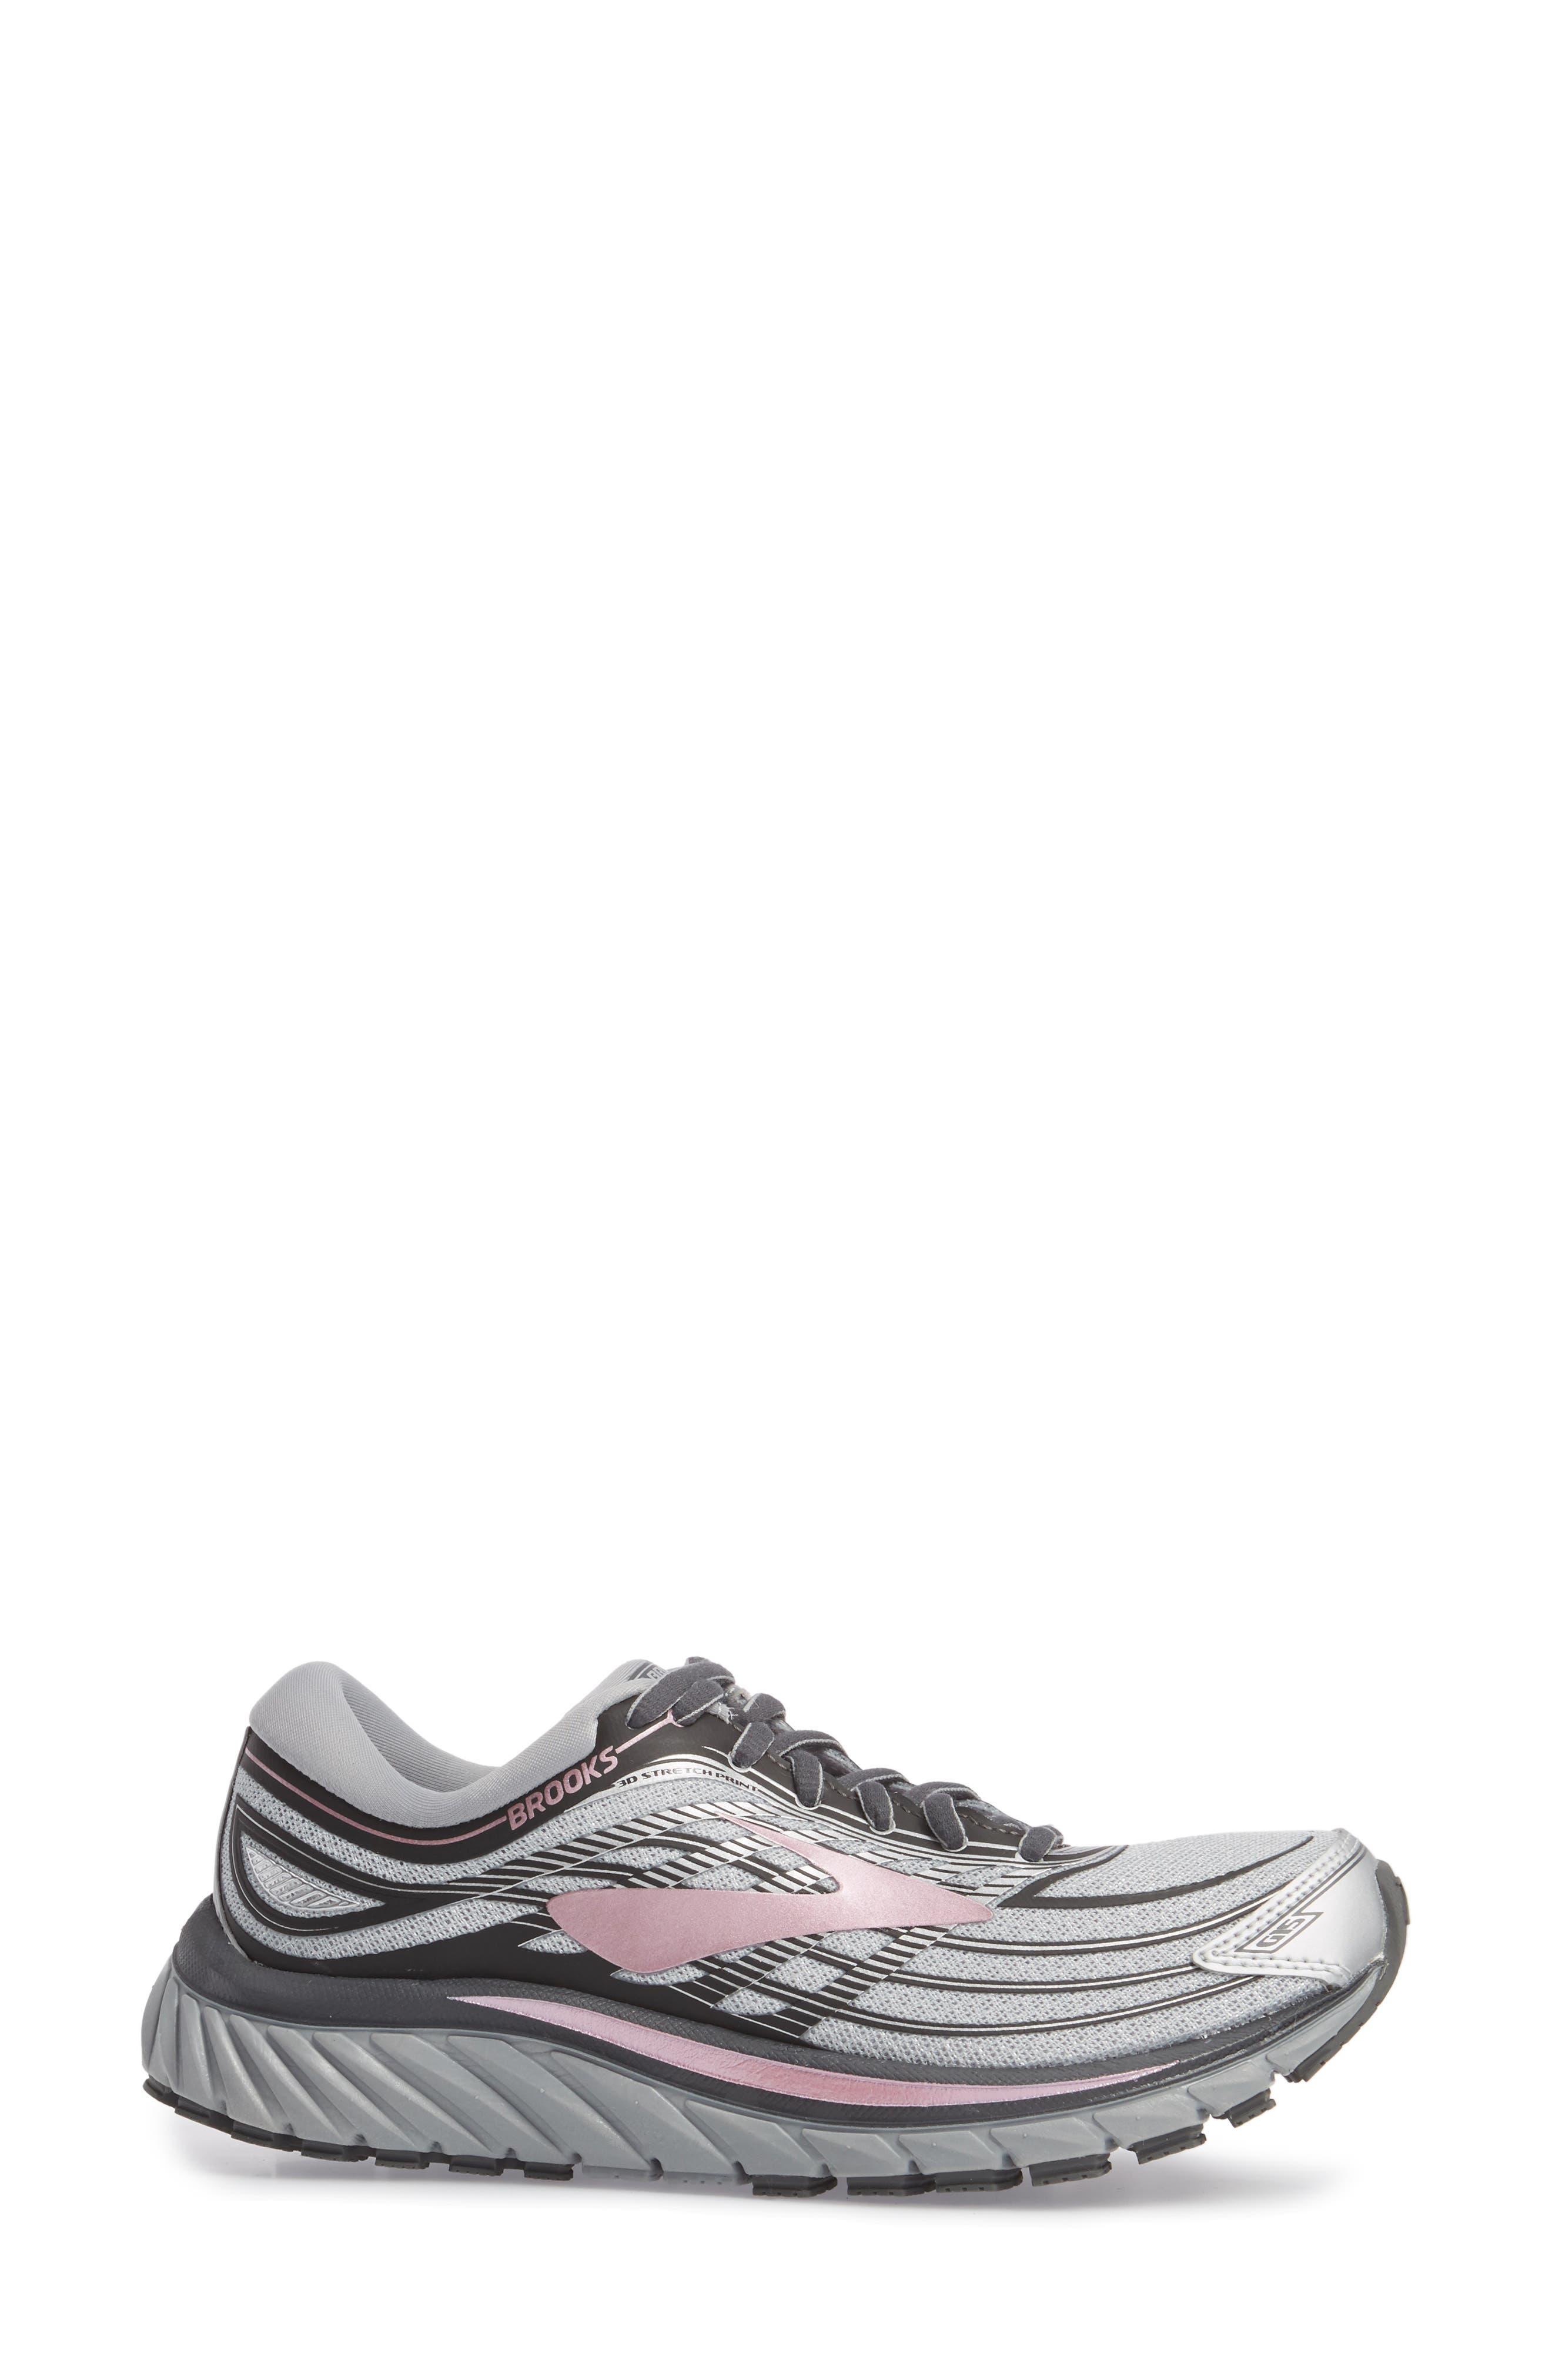 Glycerin 15 Running Shoe,                             Alternate thumbnail 3, color,                             Silver/ Grey/ Rose